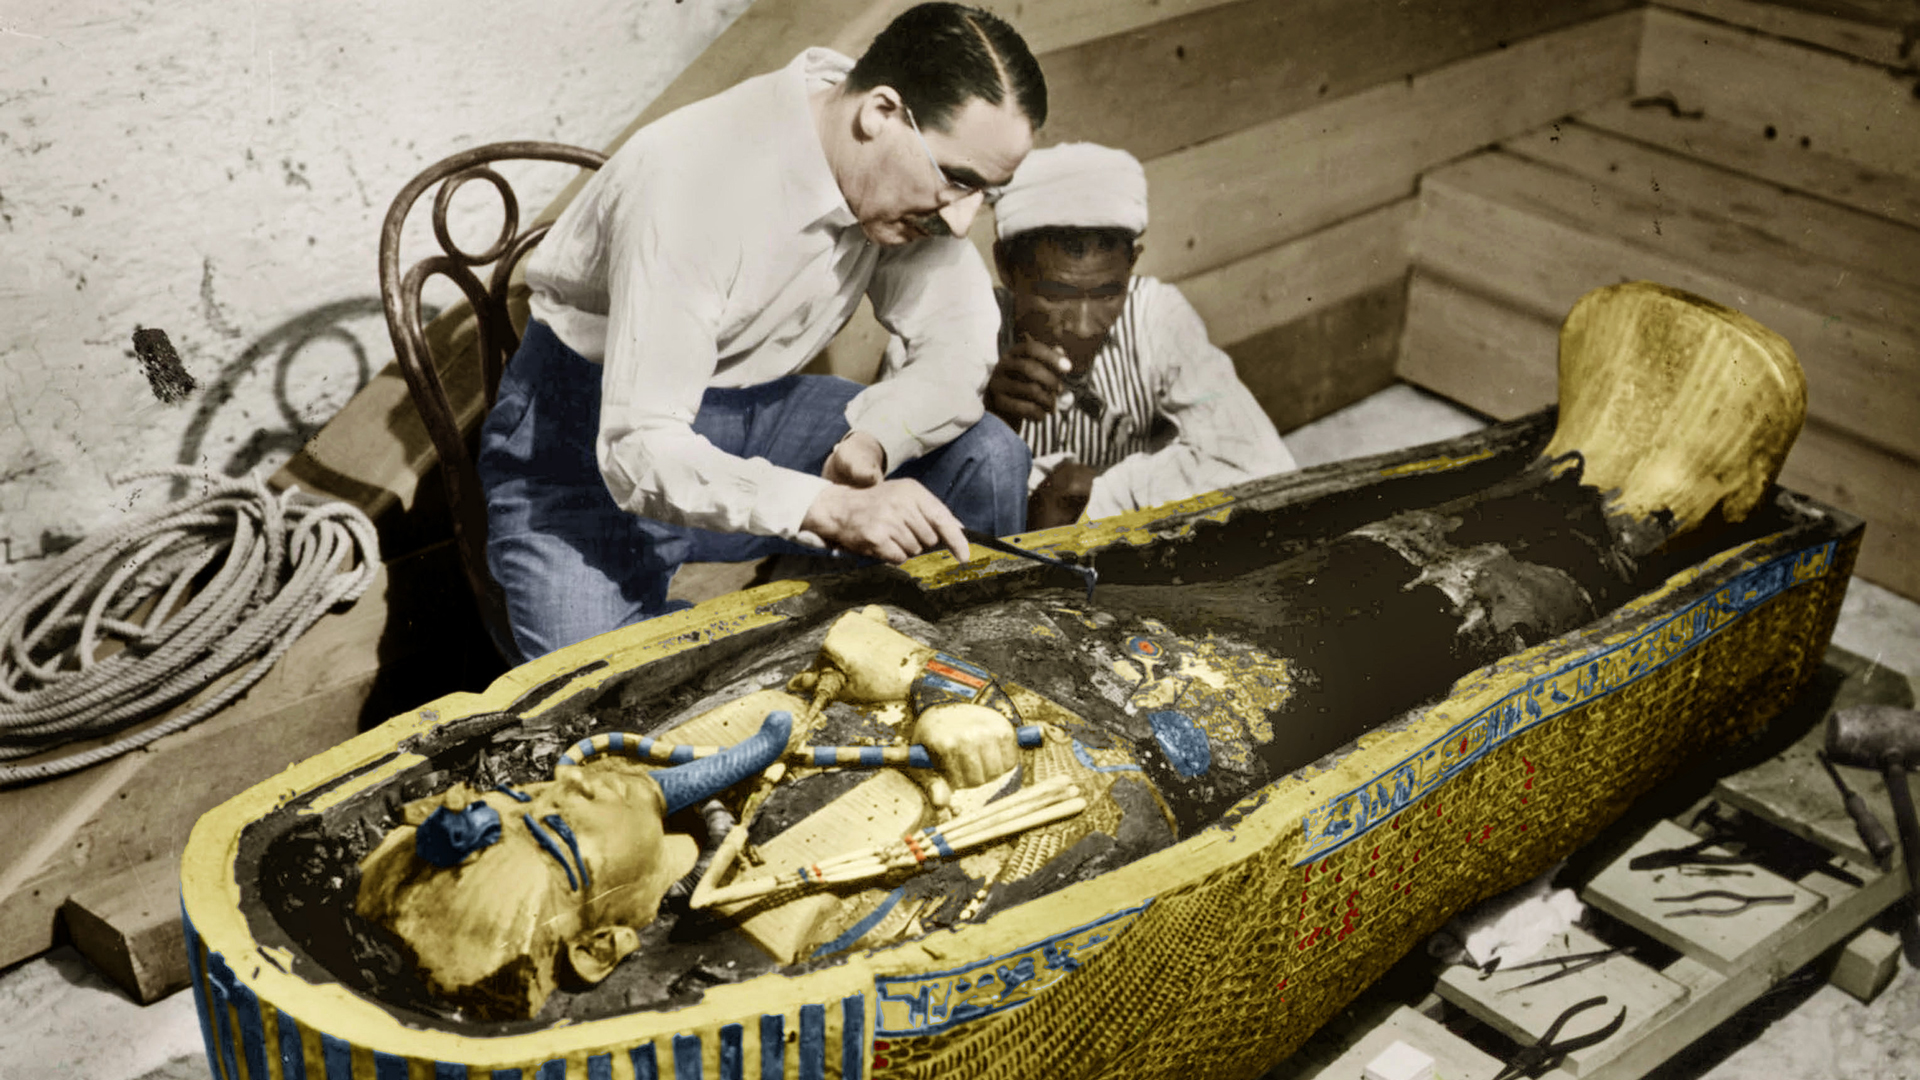 Howard Carter and an Egyptian worker examine the sarcophagus of King Tutankhamun, circa February 1923.